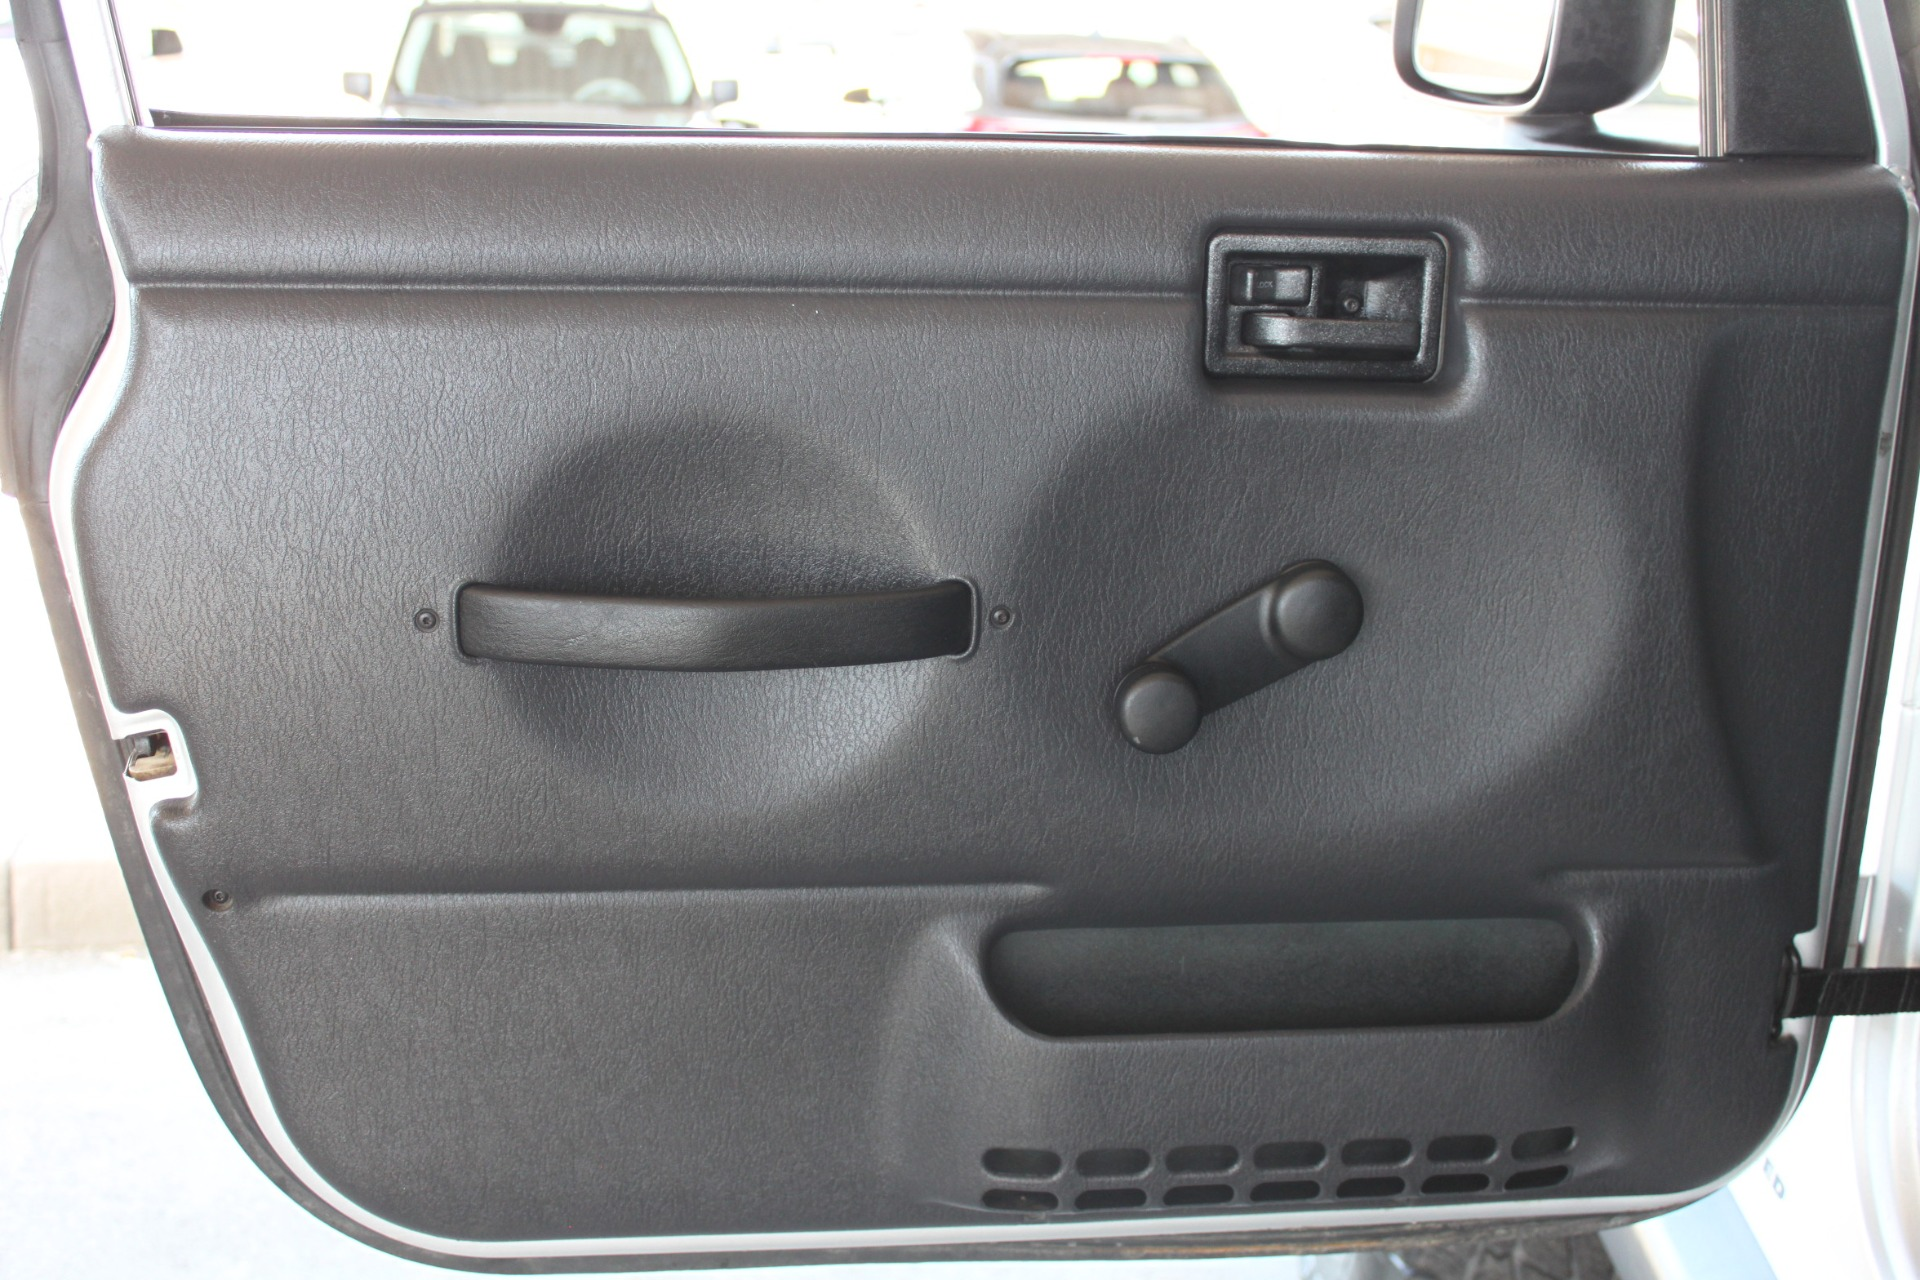 Used-2006-Jeep-Wrangler-Unlimited-LWB-Toyota